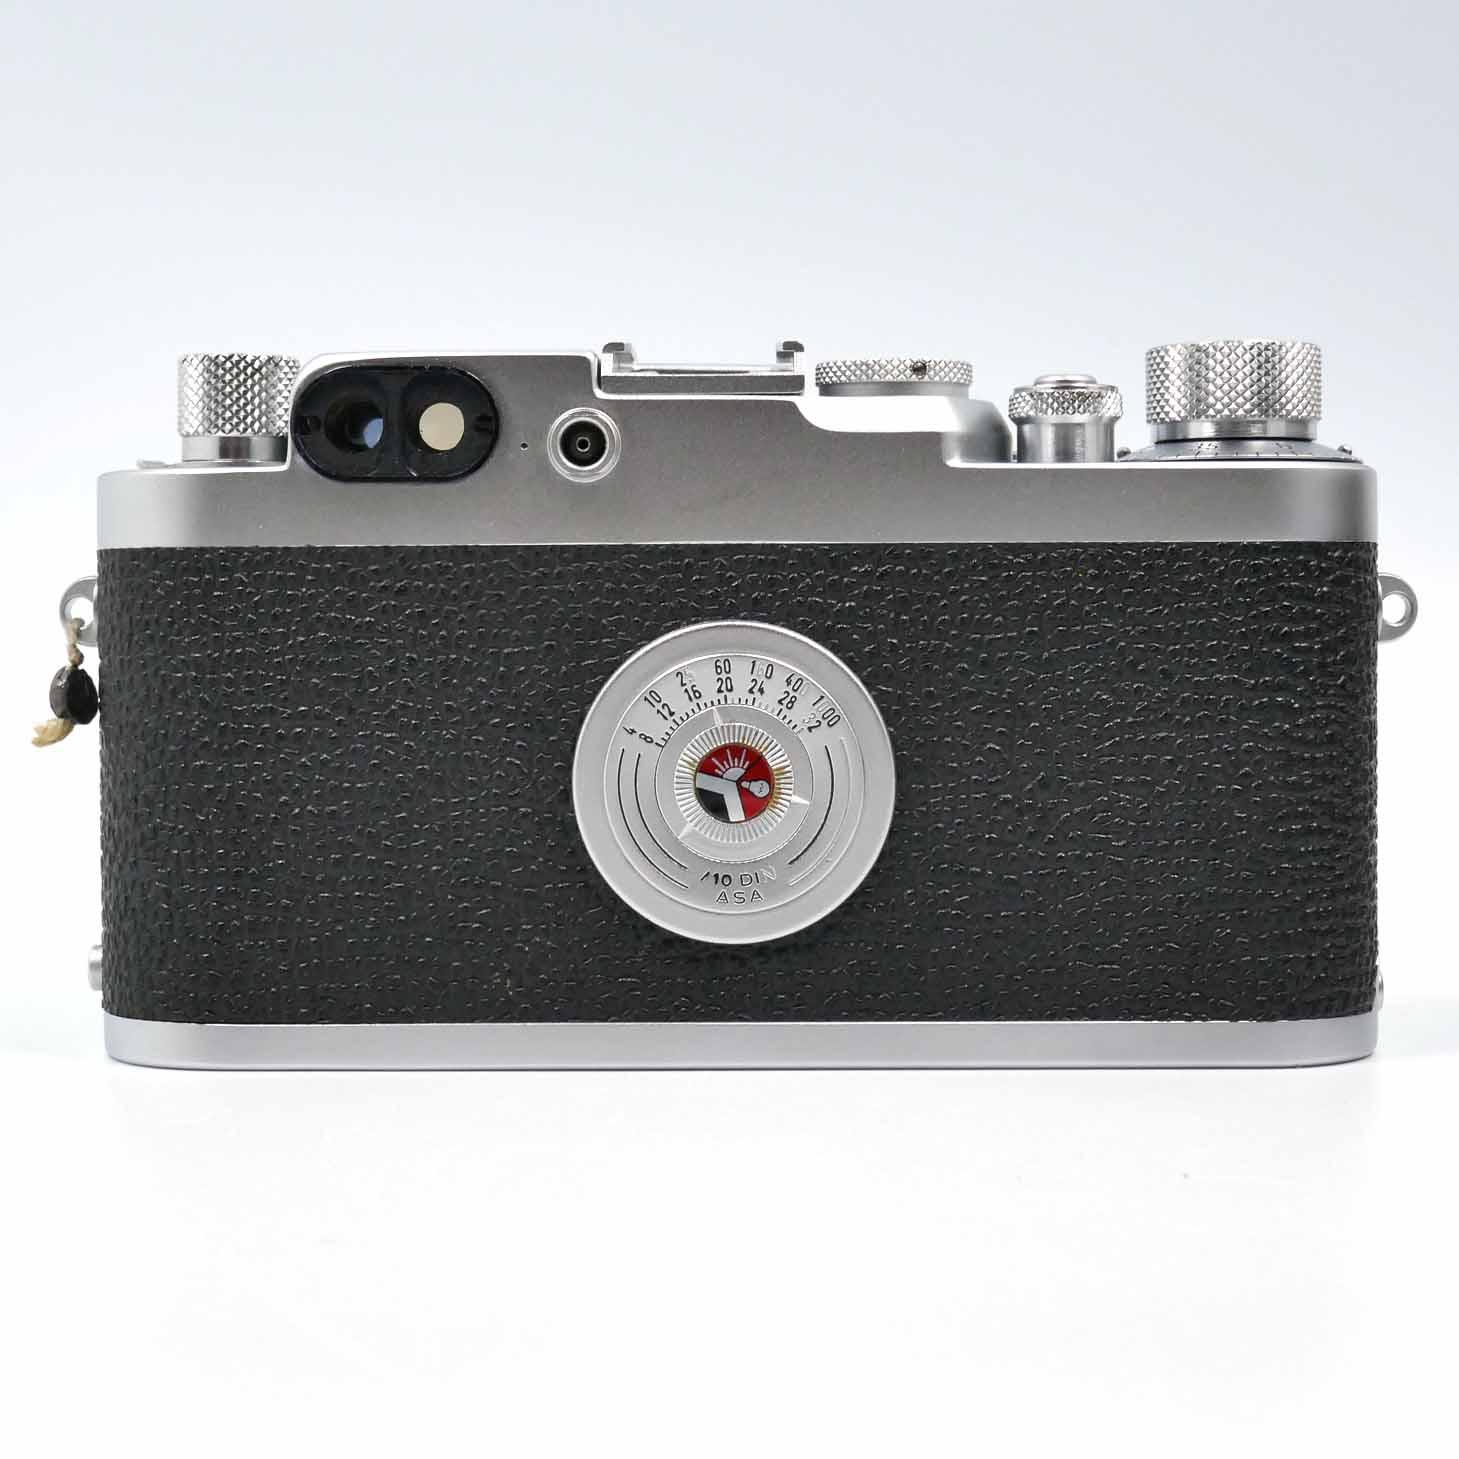 clean-cameras-Leica-IIIg+Summicron-2.0-5cm20